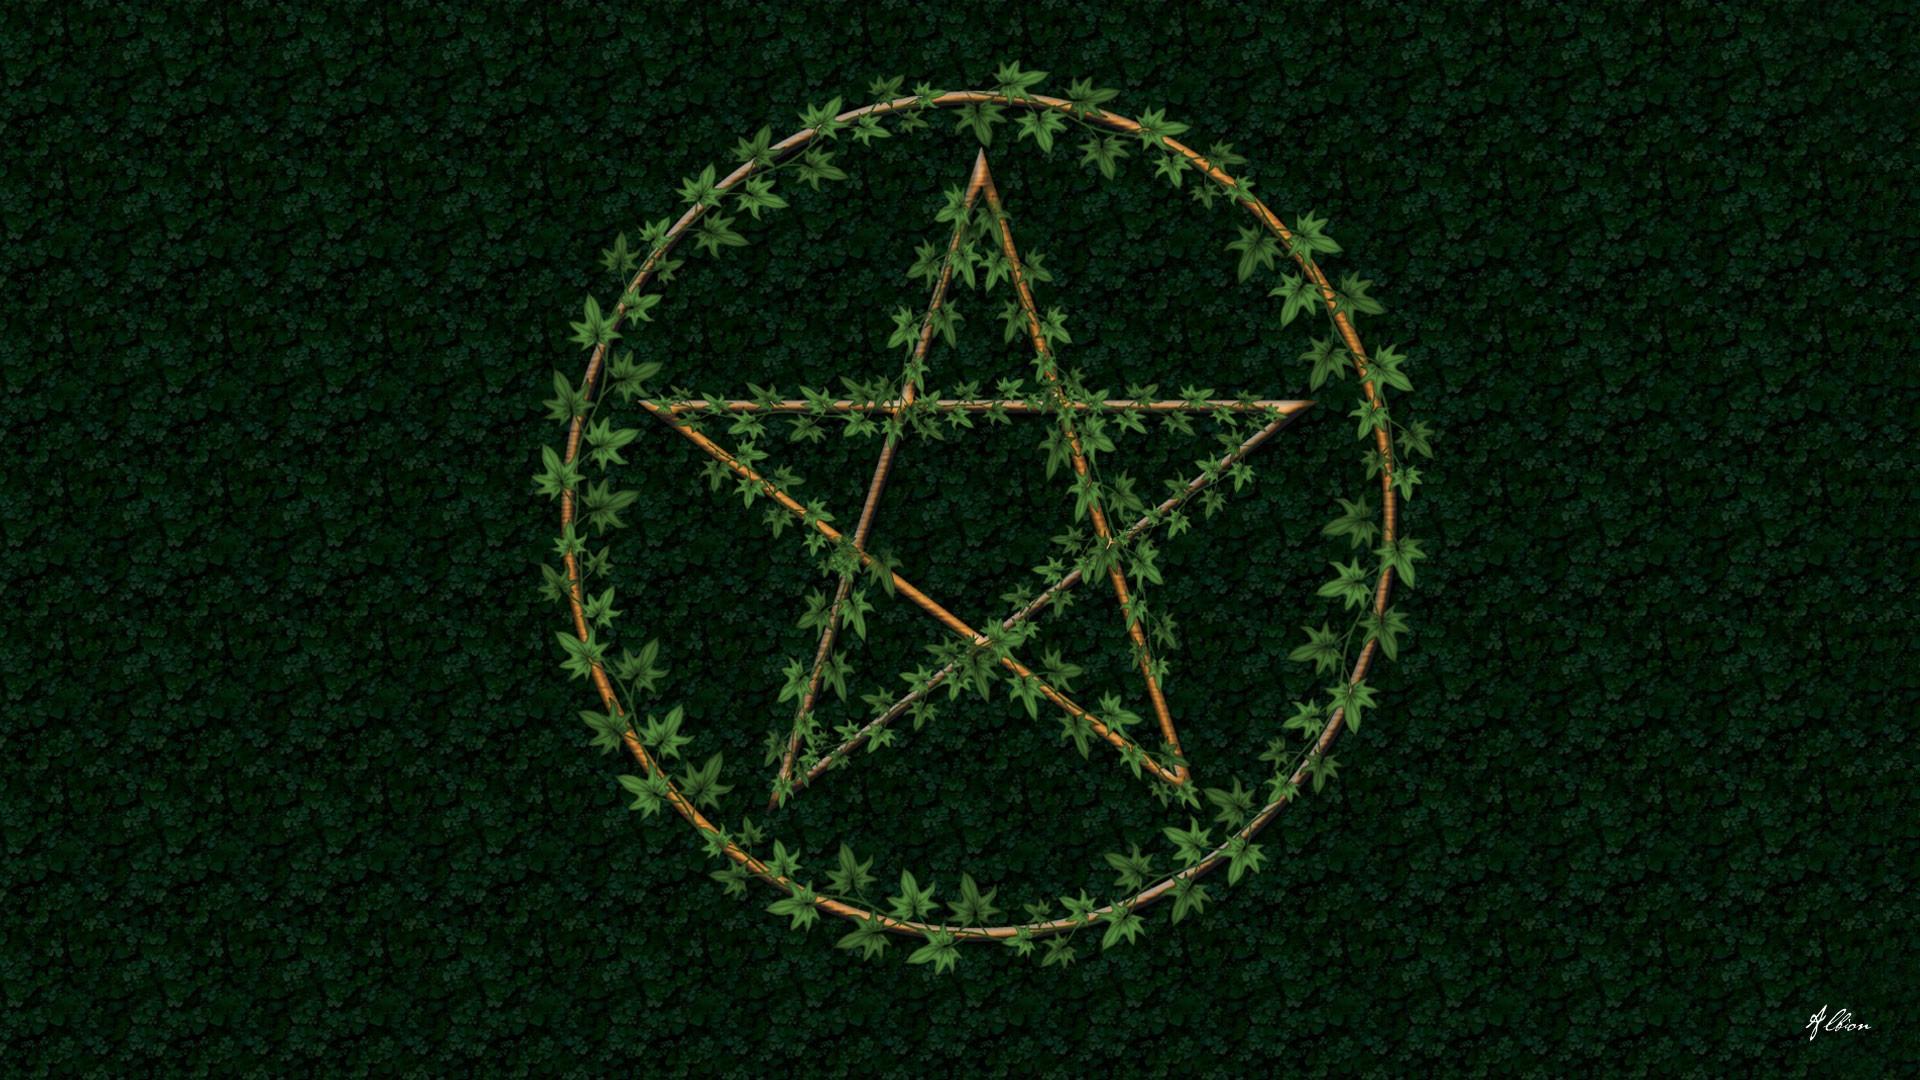 Pagan Wallpaper For Android: Pagan Wallpaper ·① Download Free Stunning Full HD